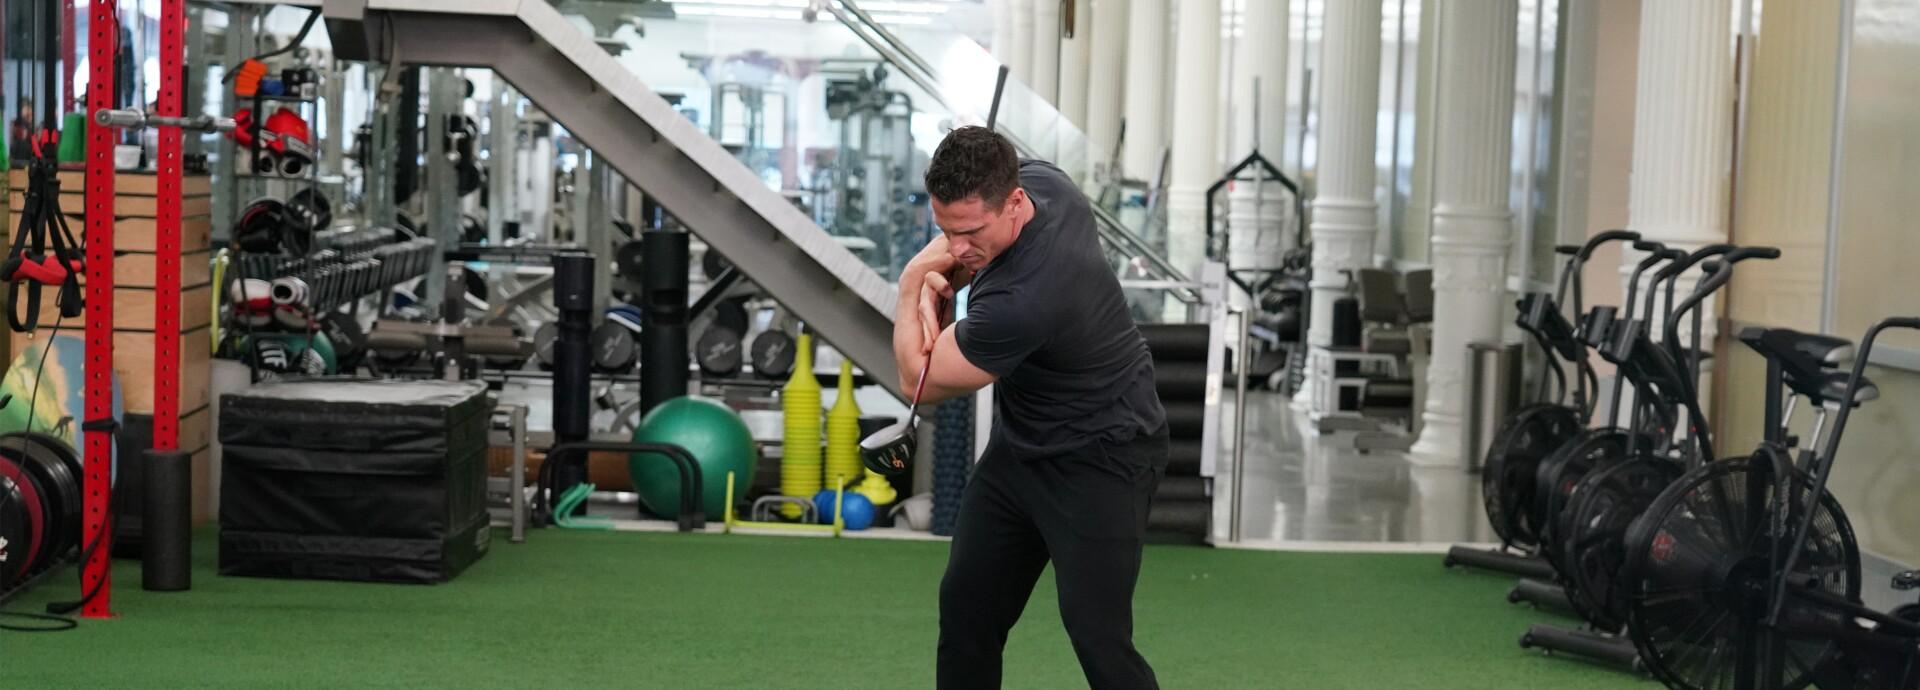 fitness-stretch-lede.jpg